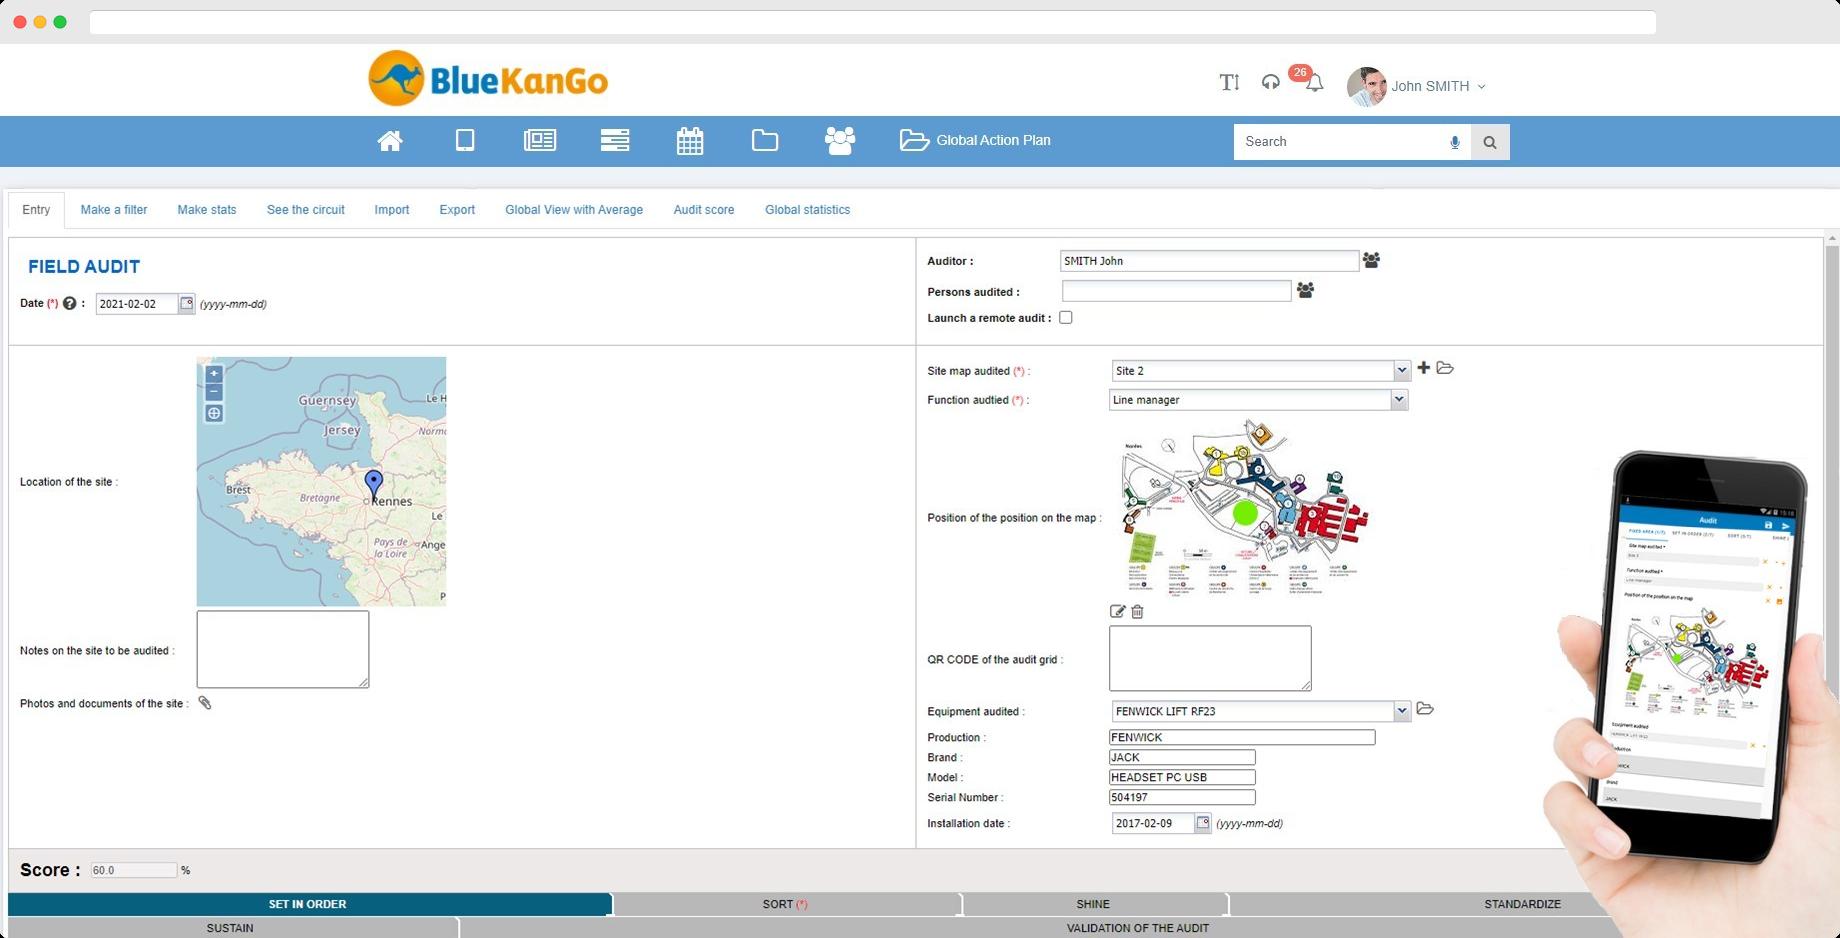 Screenshot of BlueKanGo's platform about Field audit